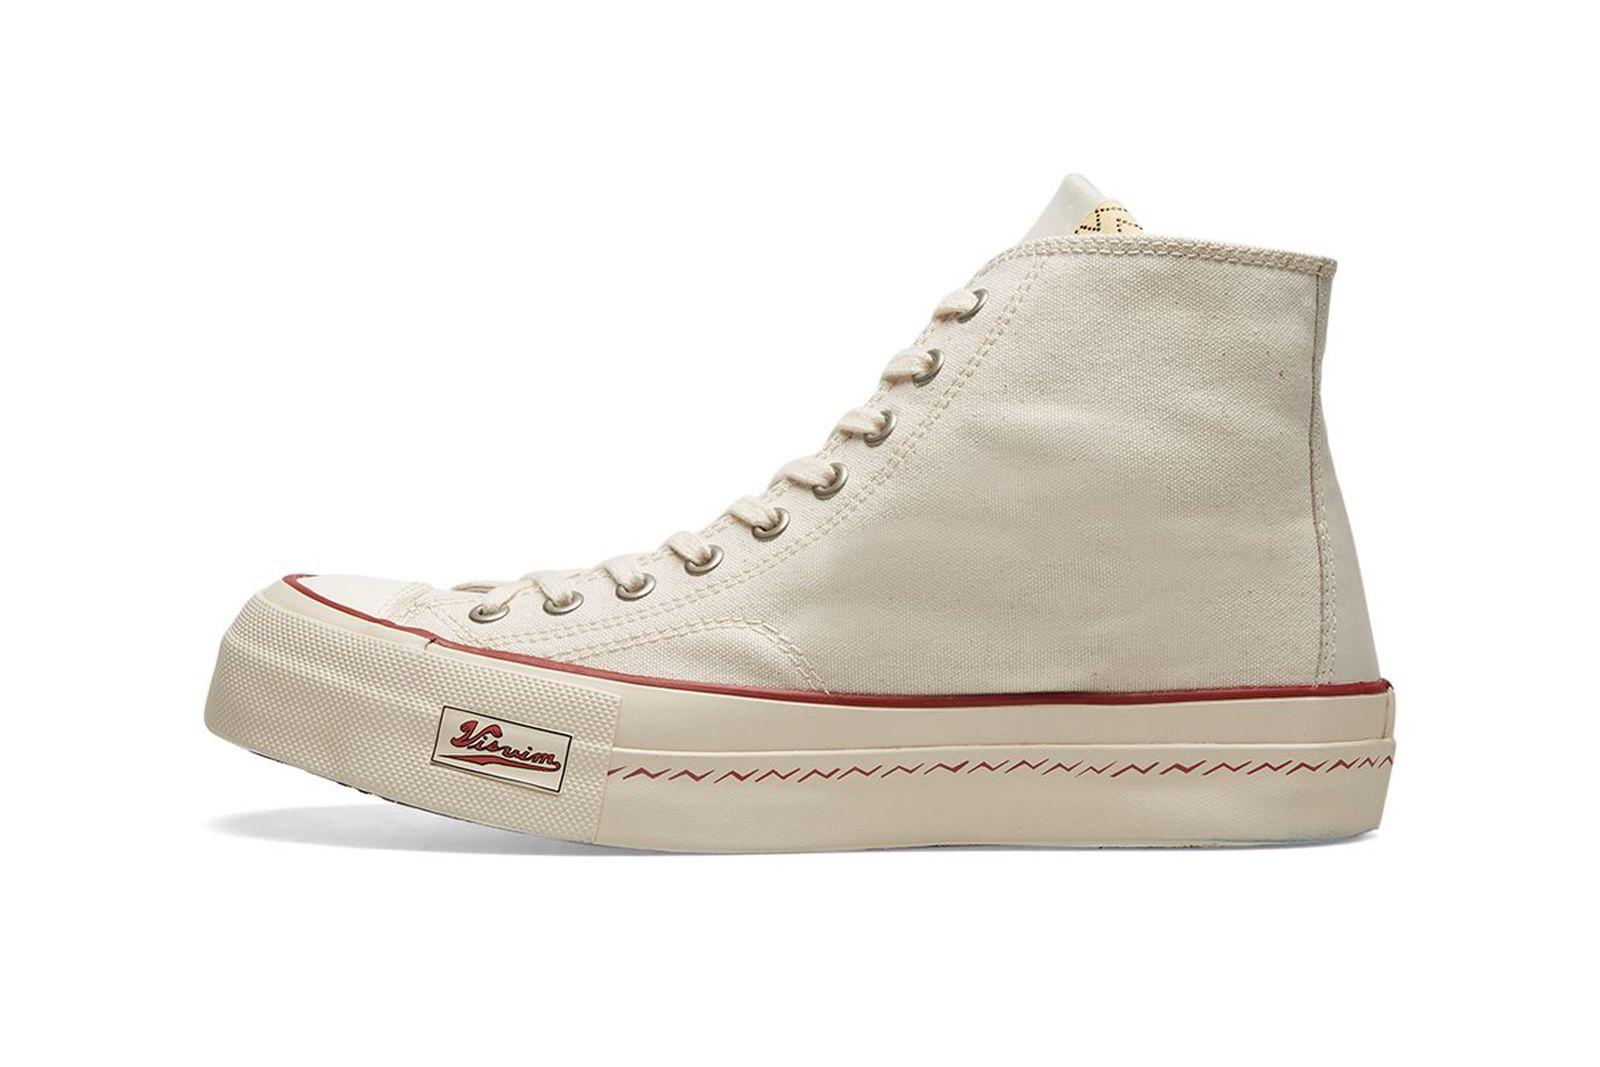 visvim ss19 skagway sneaker release date price japan visvim Skagway Patten